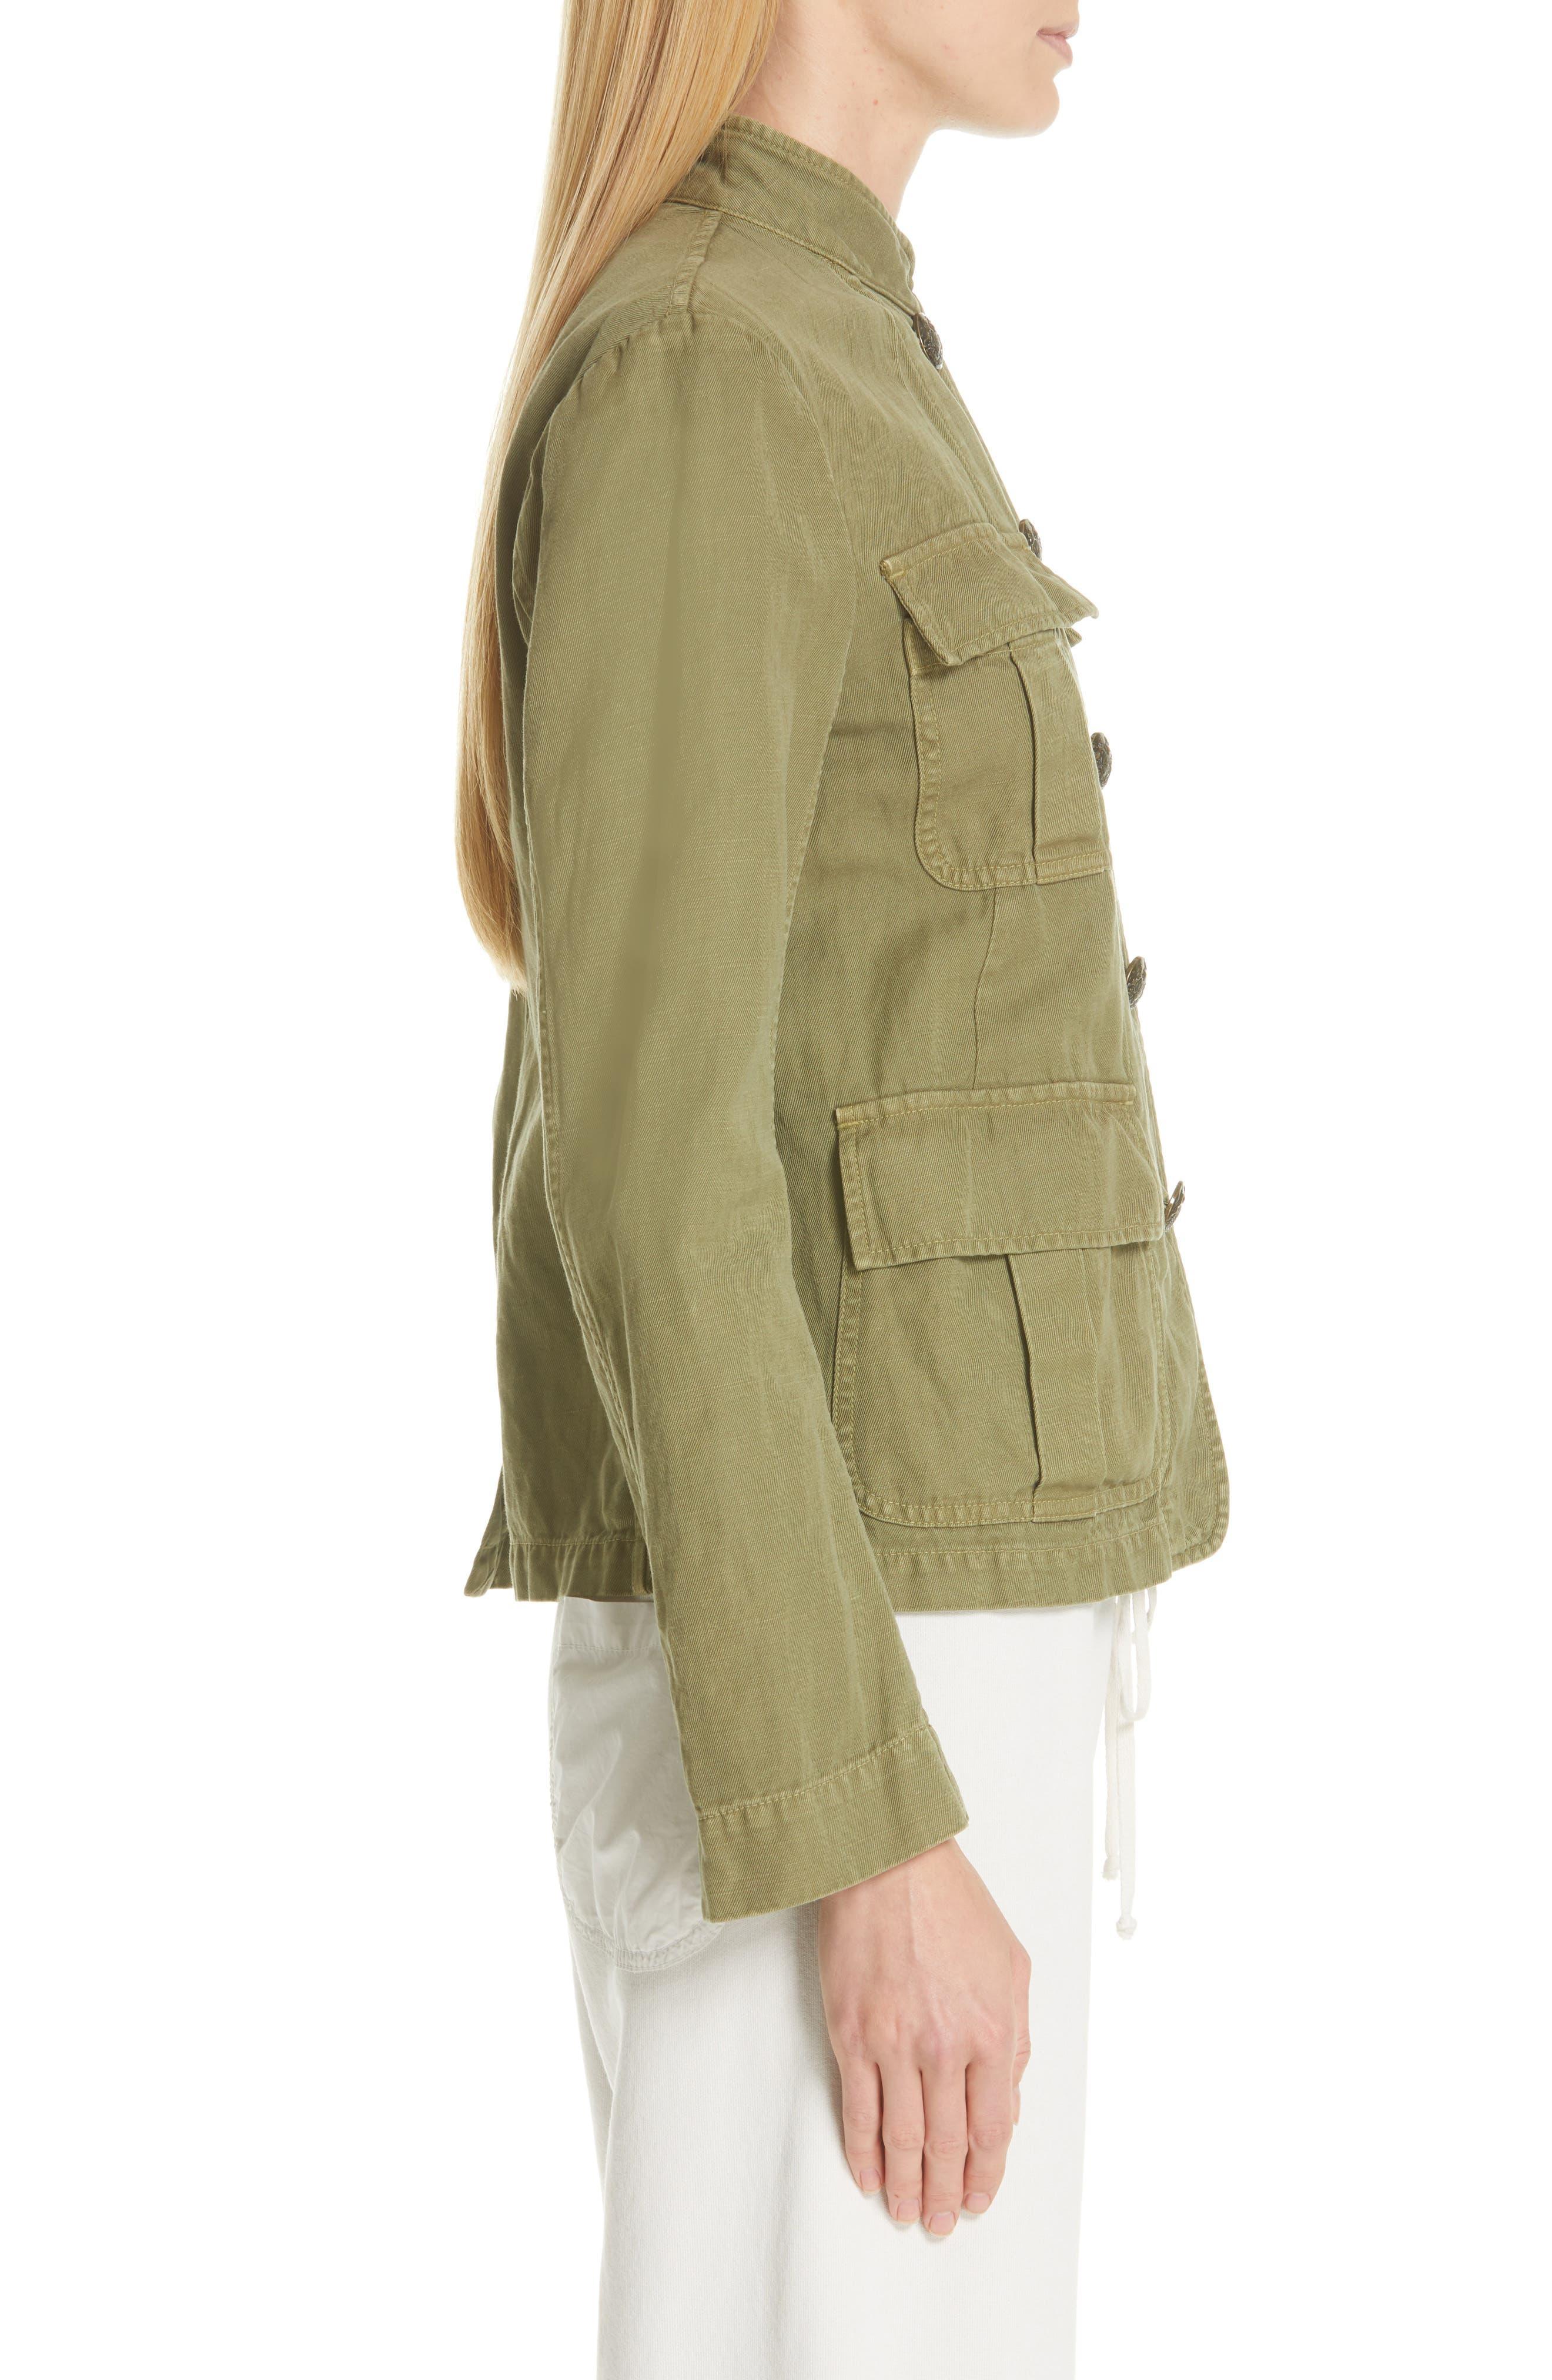 NILI LOTAN, Cambre Jacket, Alternate thumbnail 4, color, UNIFORM GREEN